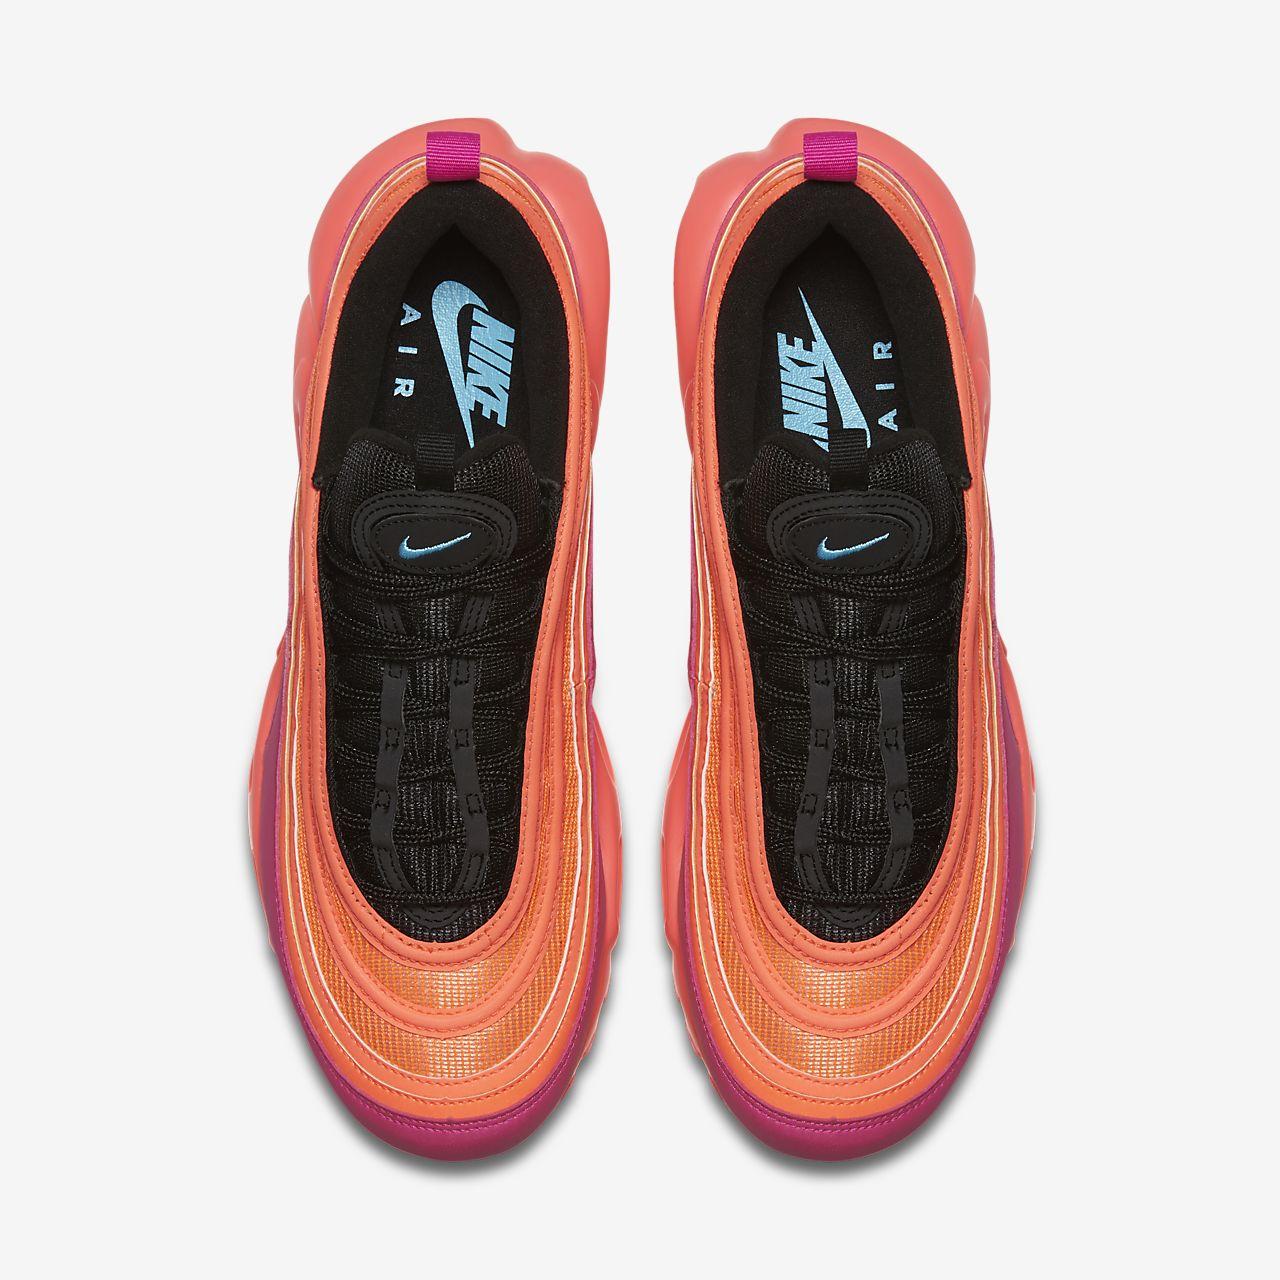 0ae01e1161 Nike Air Max Plus 97 Men's Shoe. Nike.com IN